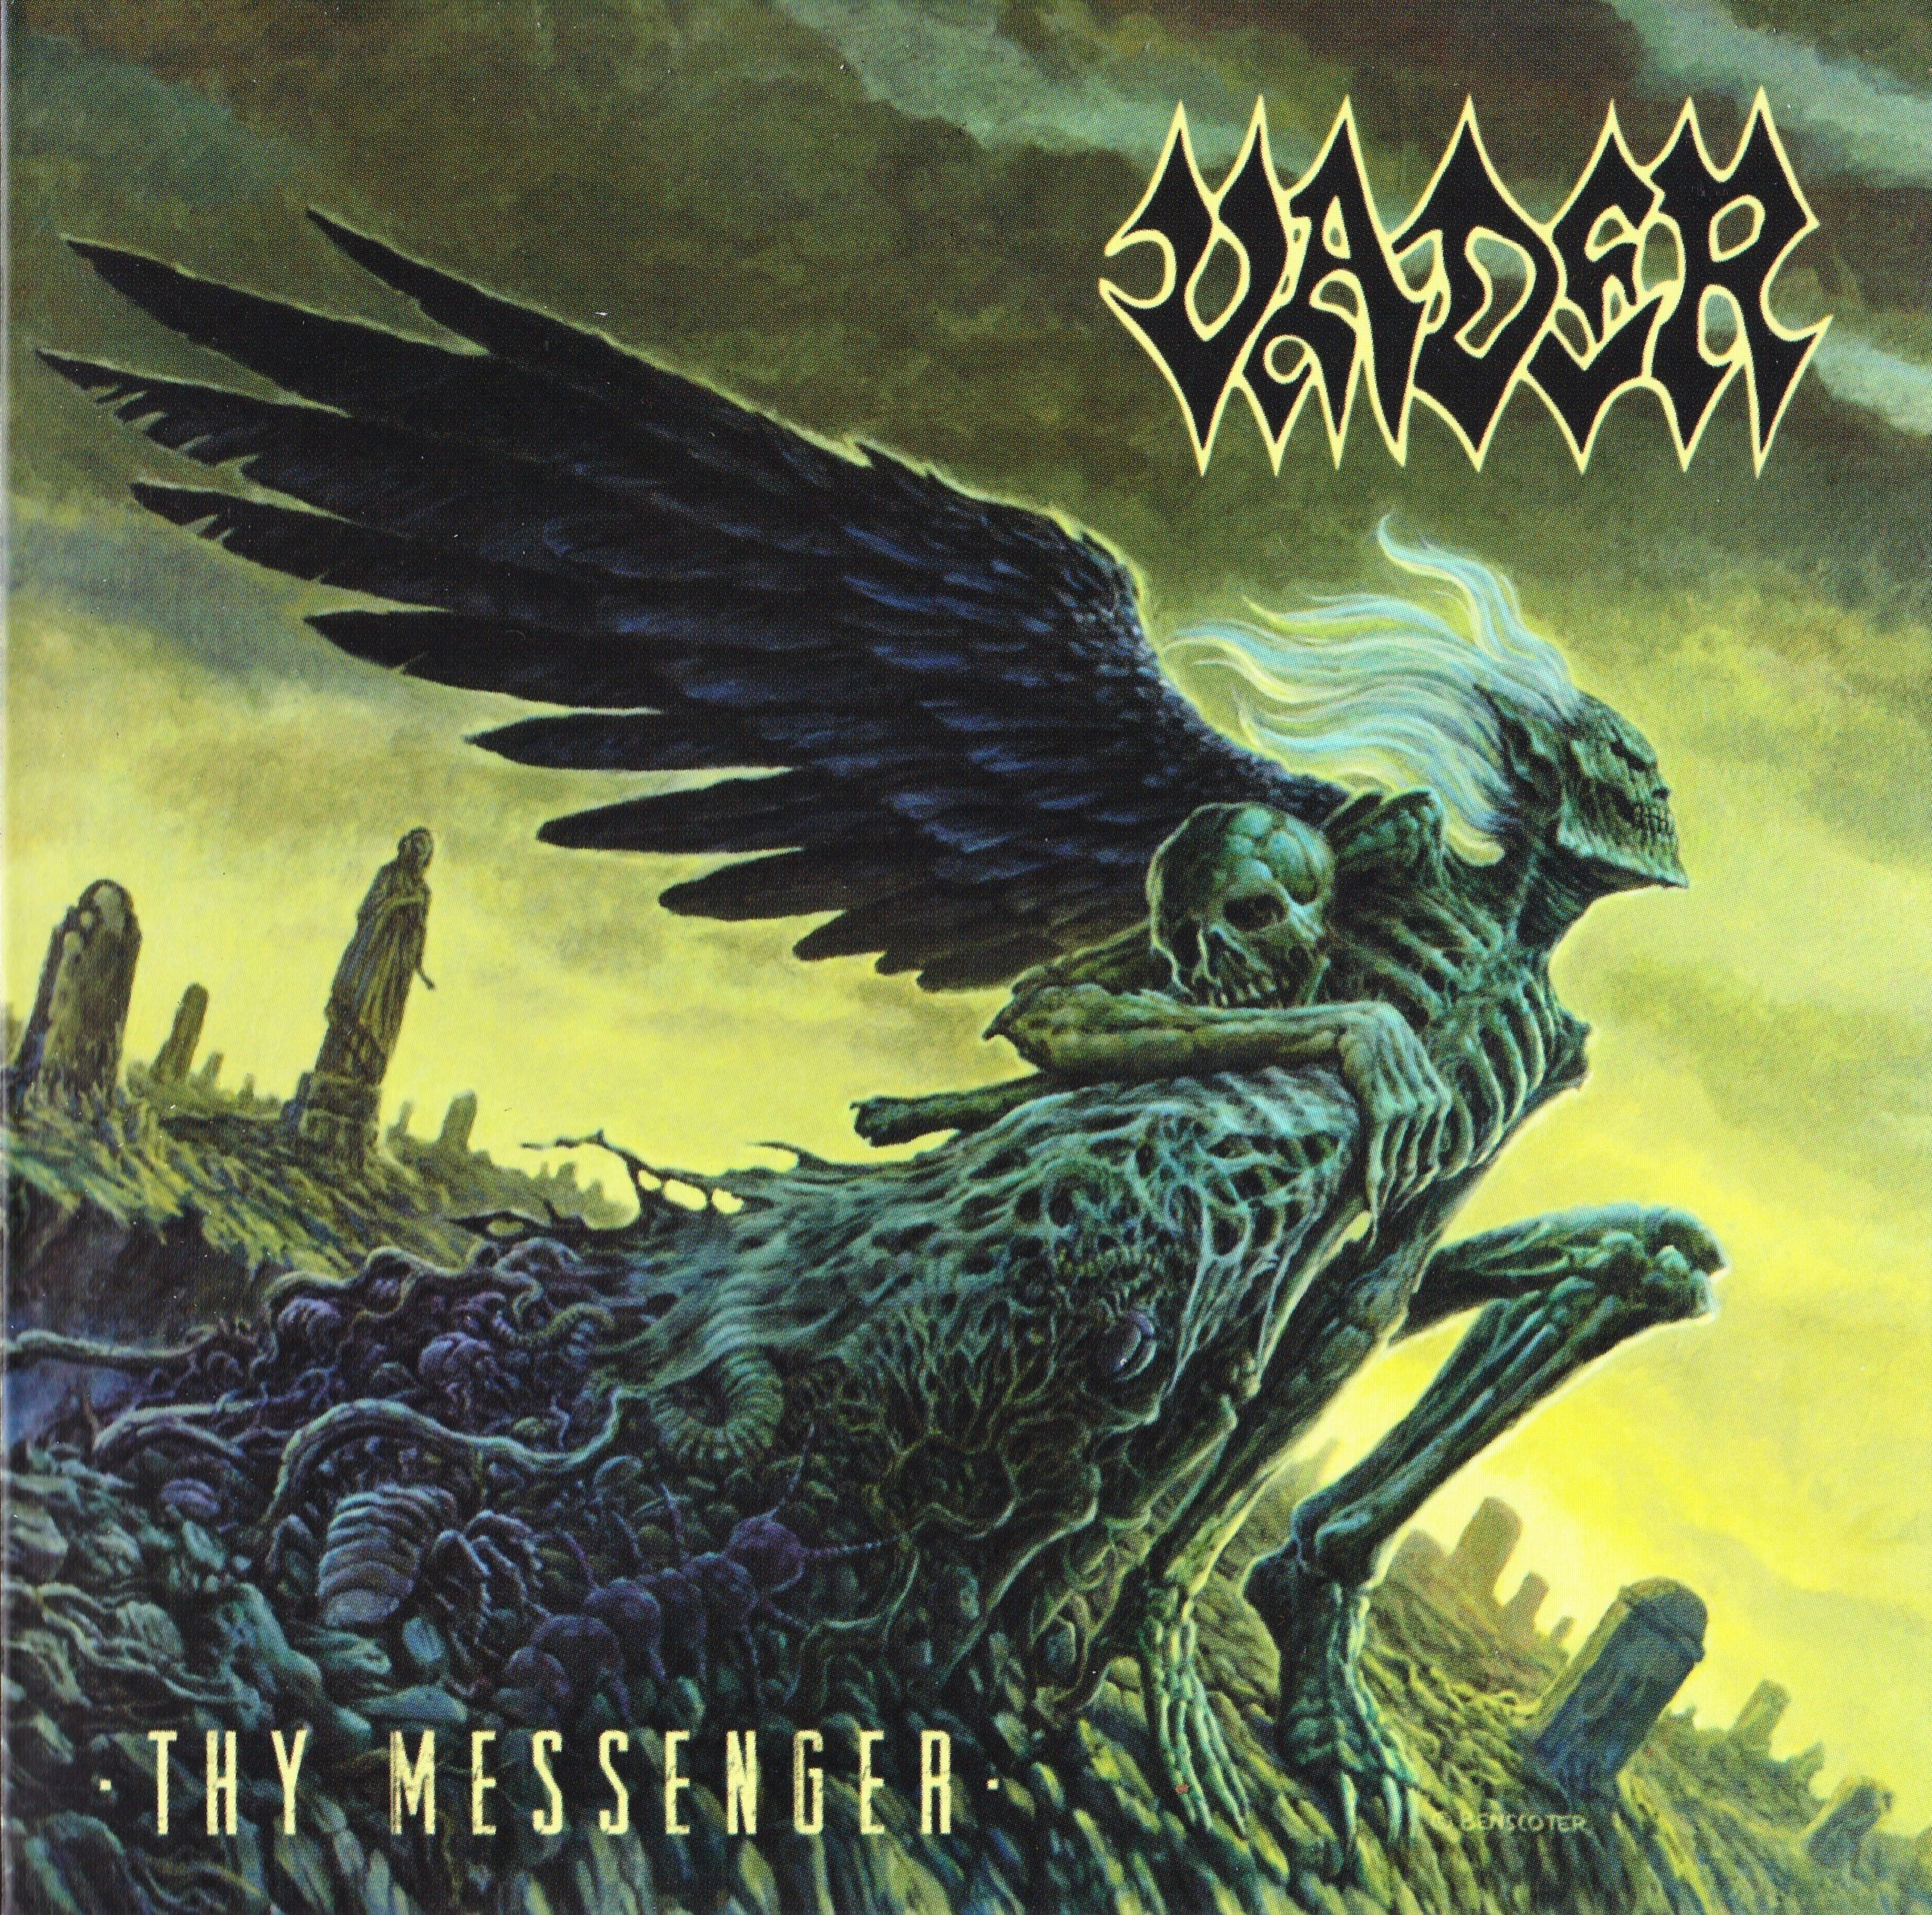 Vader — Thy Messenger EP (2019)